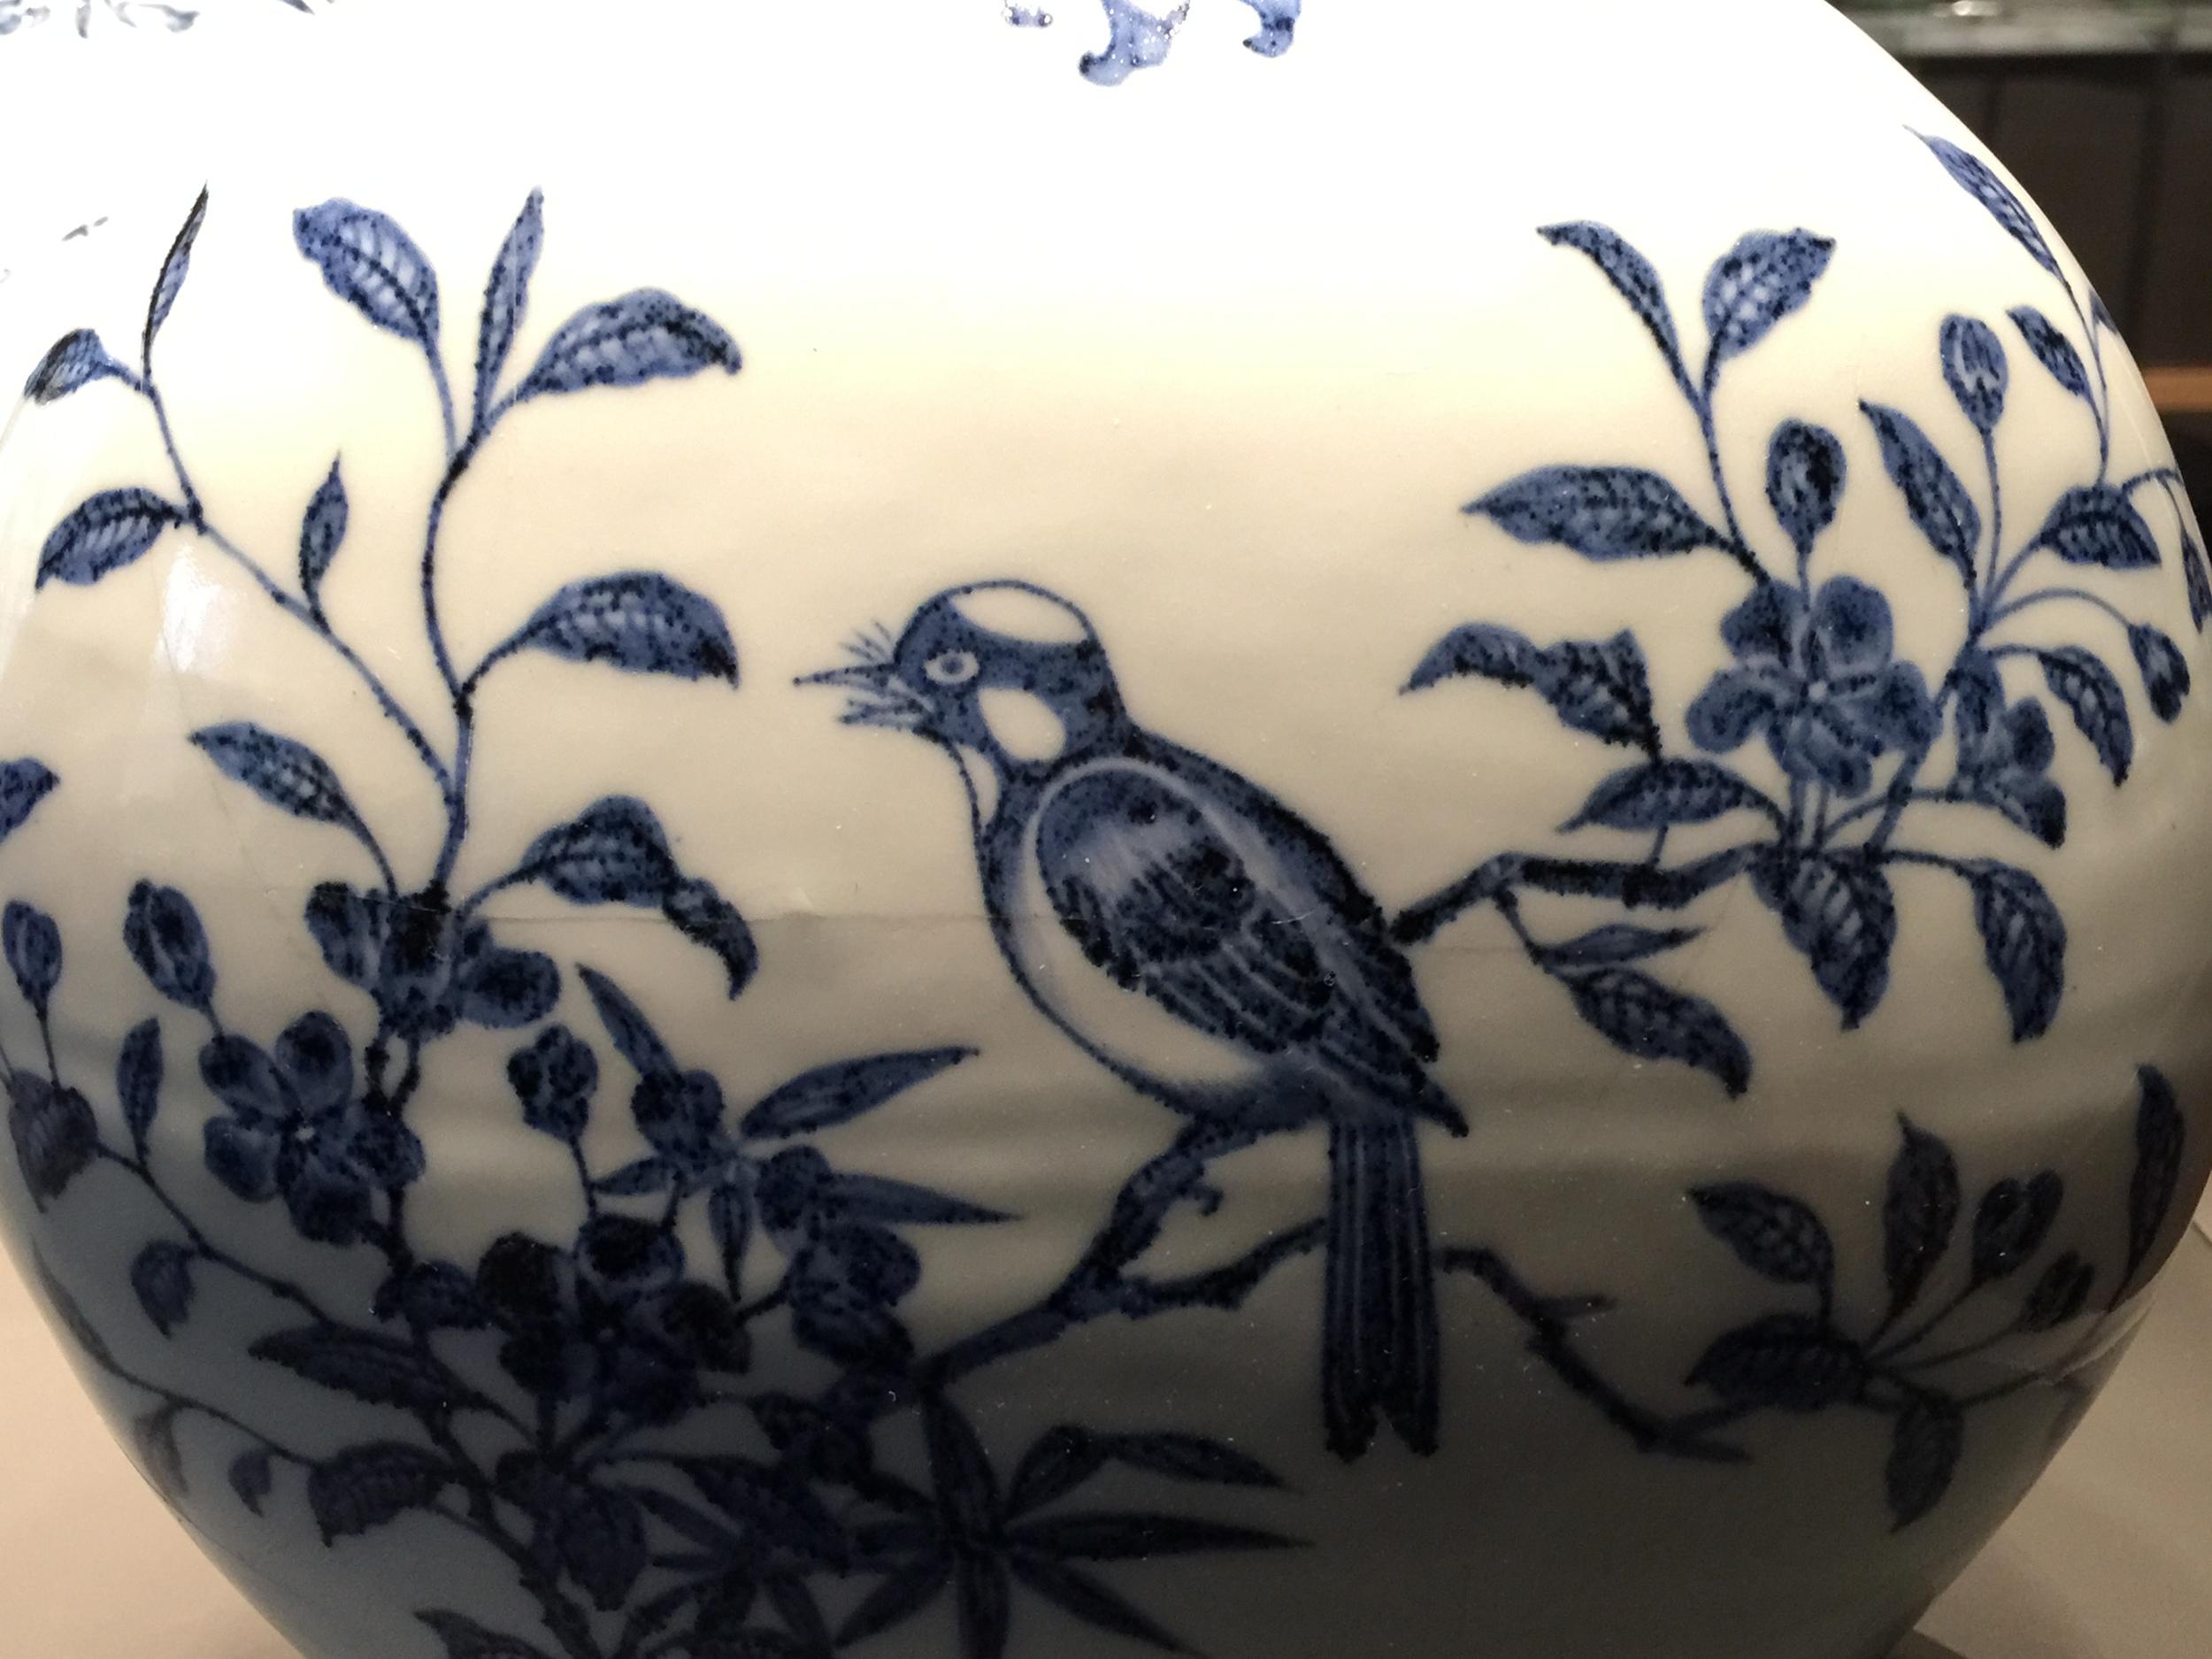 Chinese-Porcelain-British-Museum-Percival-David-jessewaugh.com-49.jpg